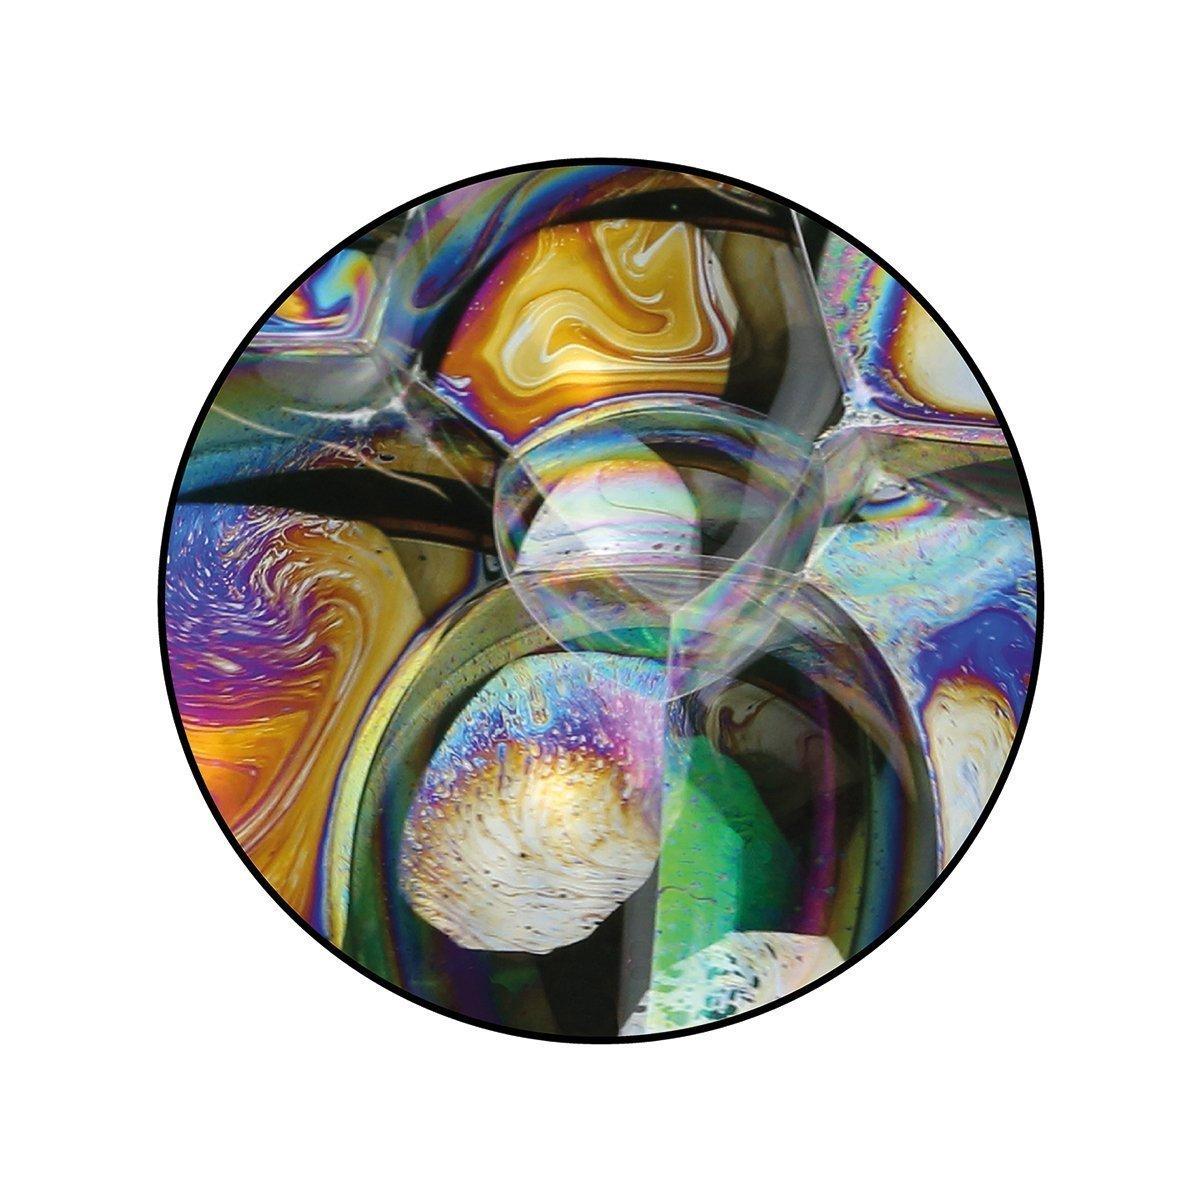 Moooi Carpets Bubble Zoom Vloerkleed �250 - Oil - Soft Yarn